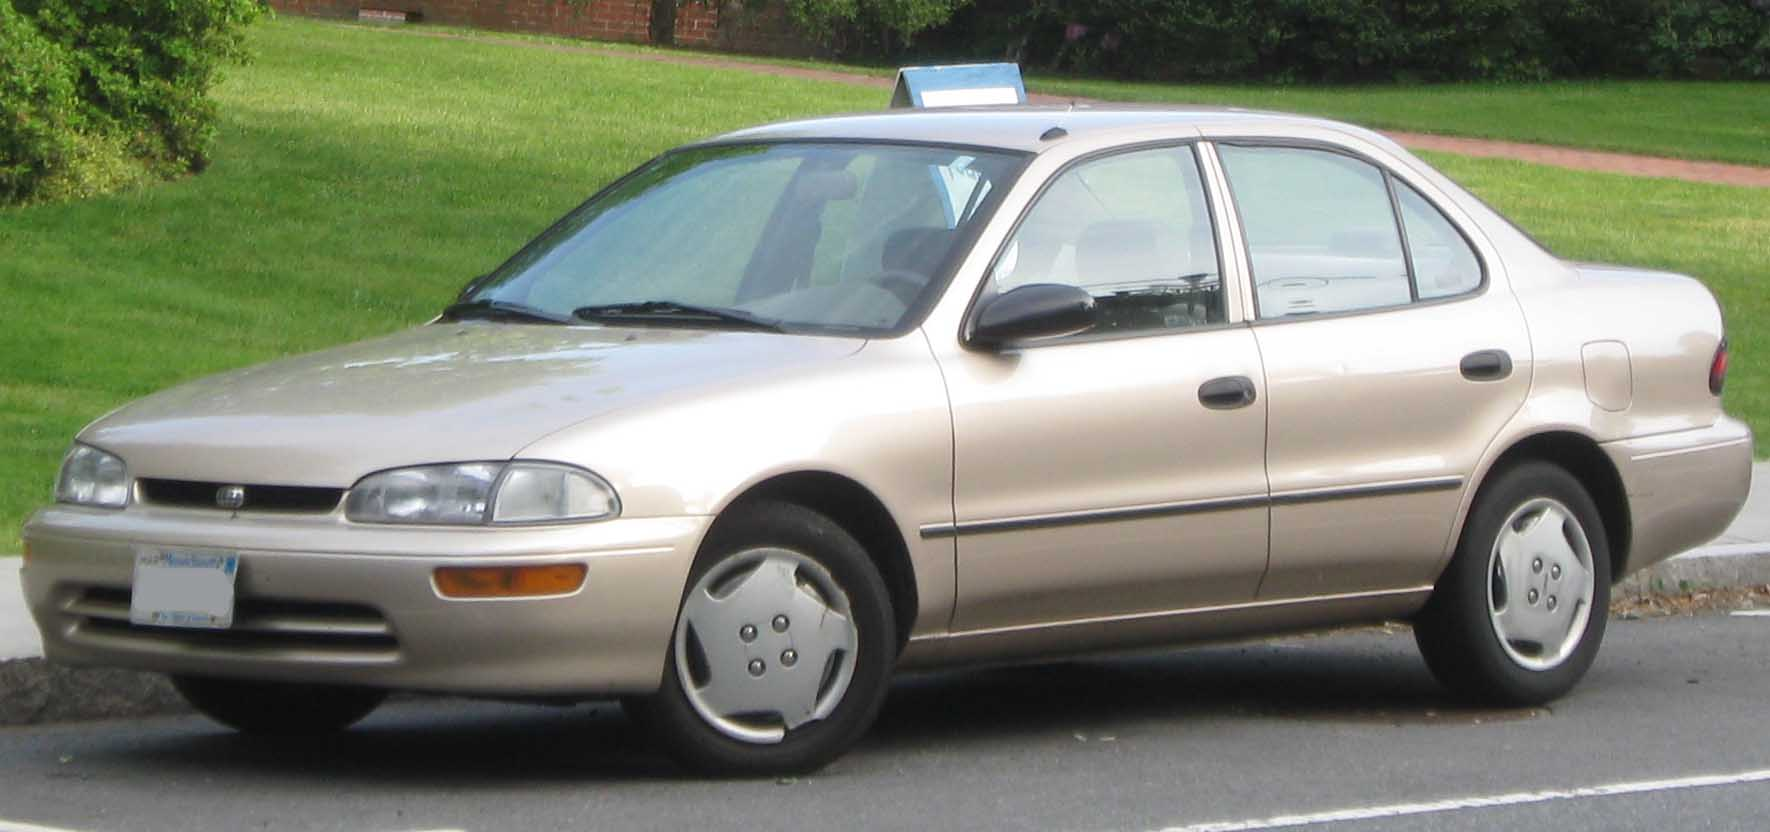 2001 Chevrolet Prizm #3 Chevrolet Prizm #3